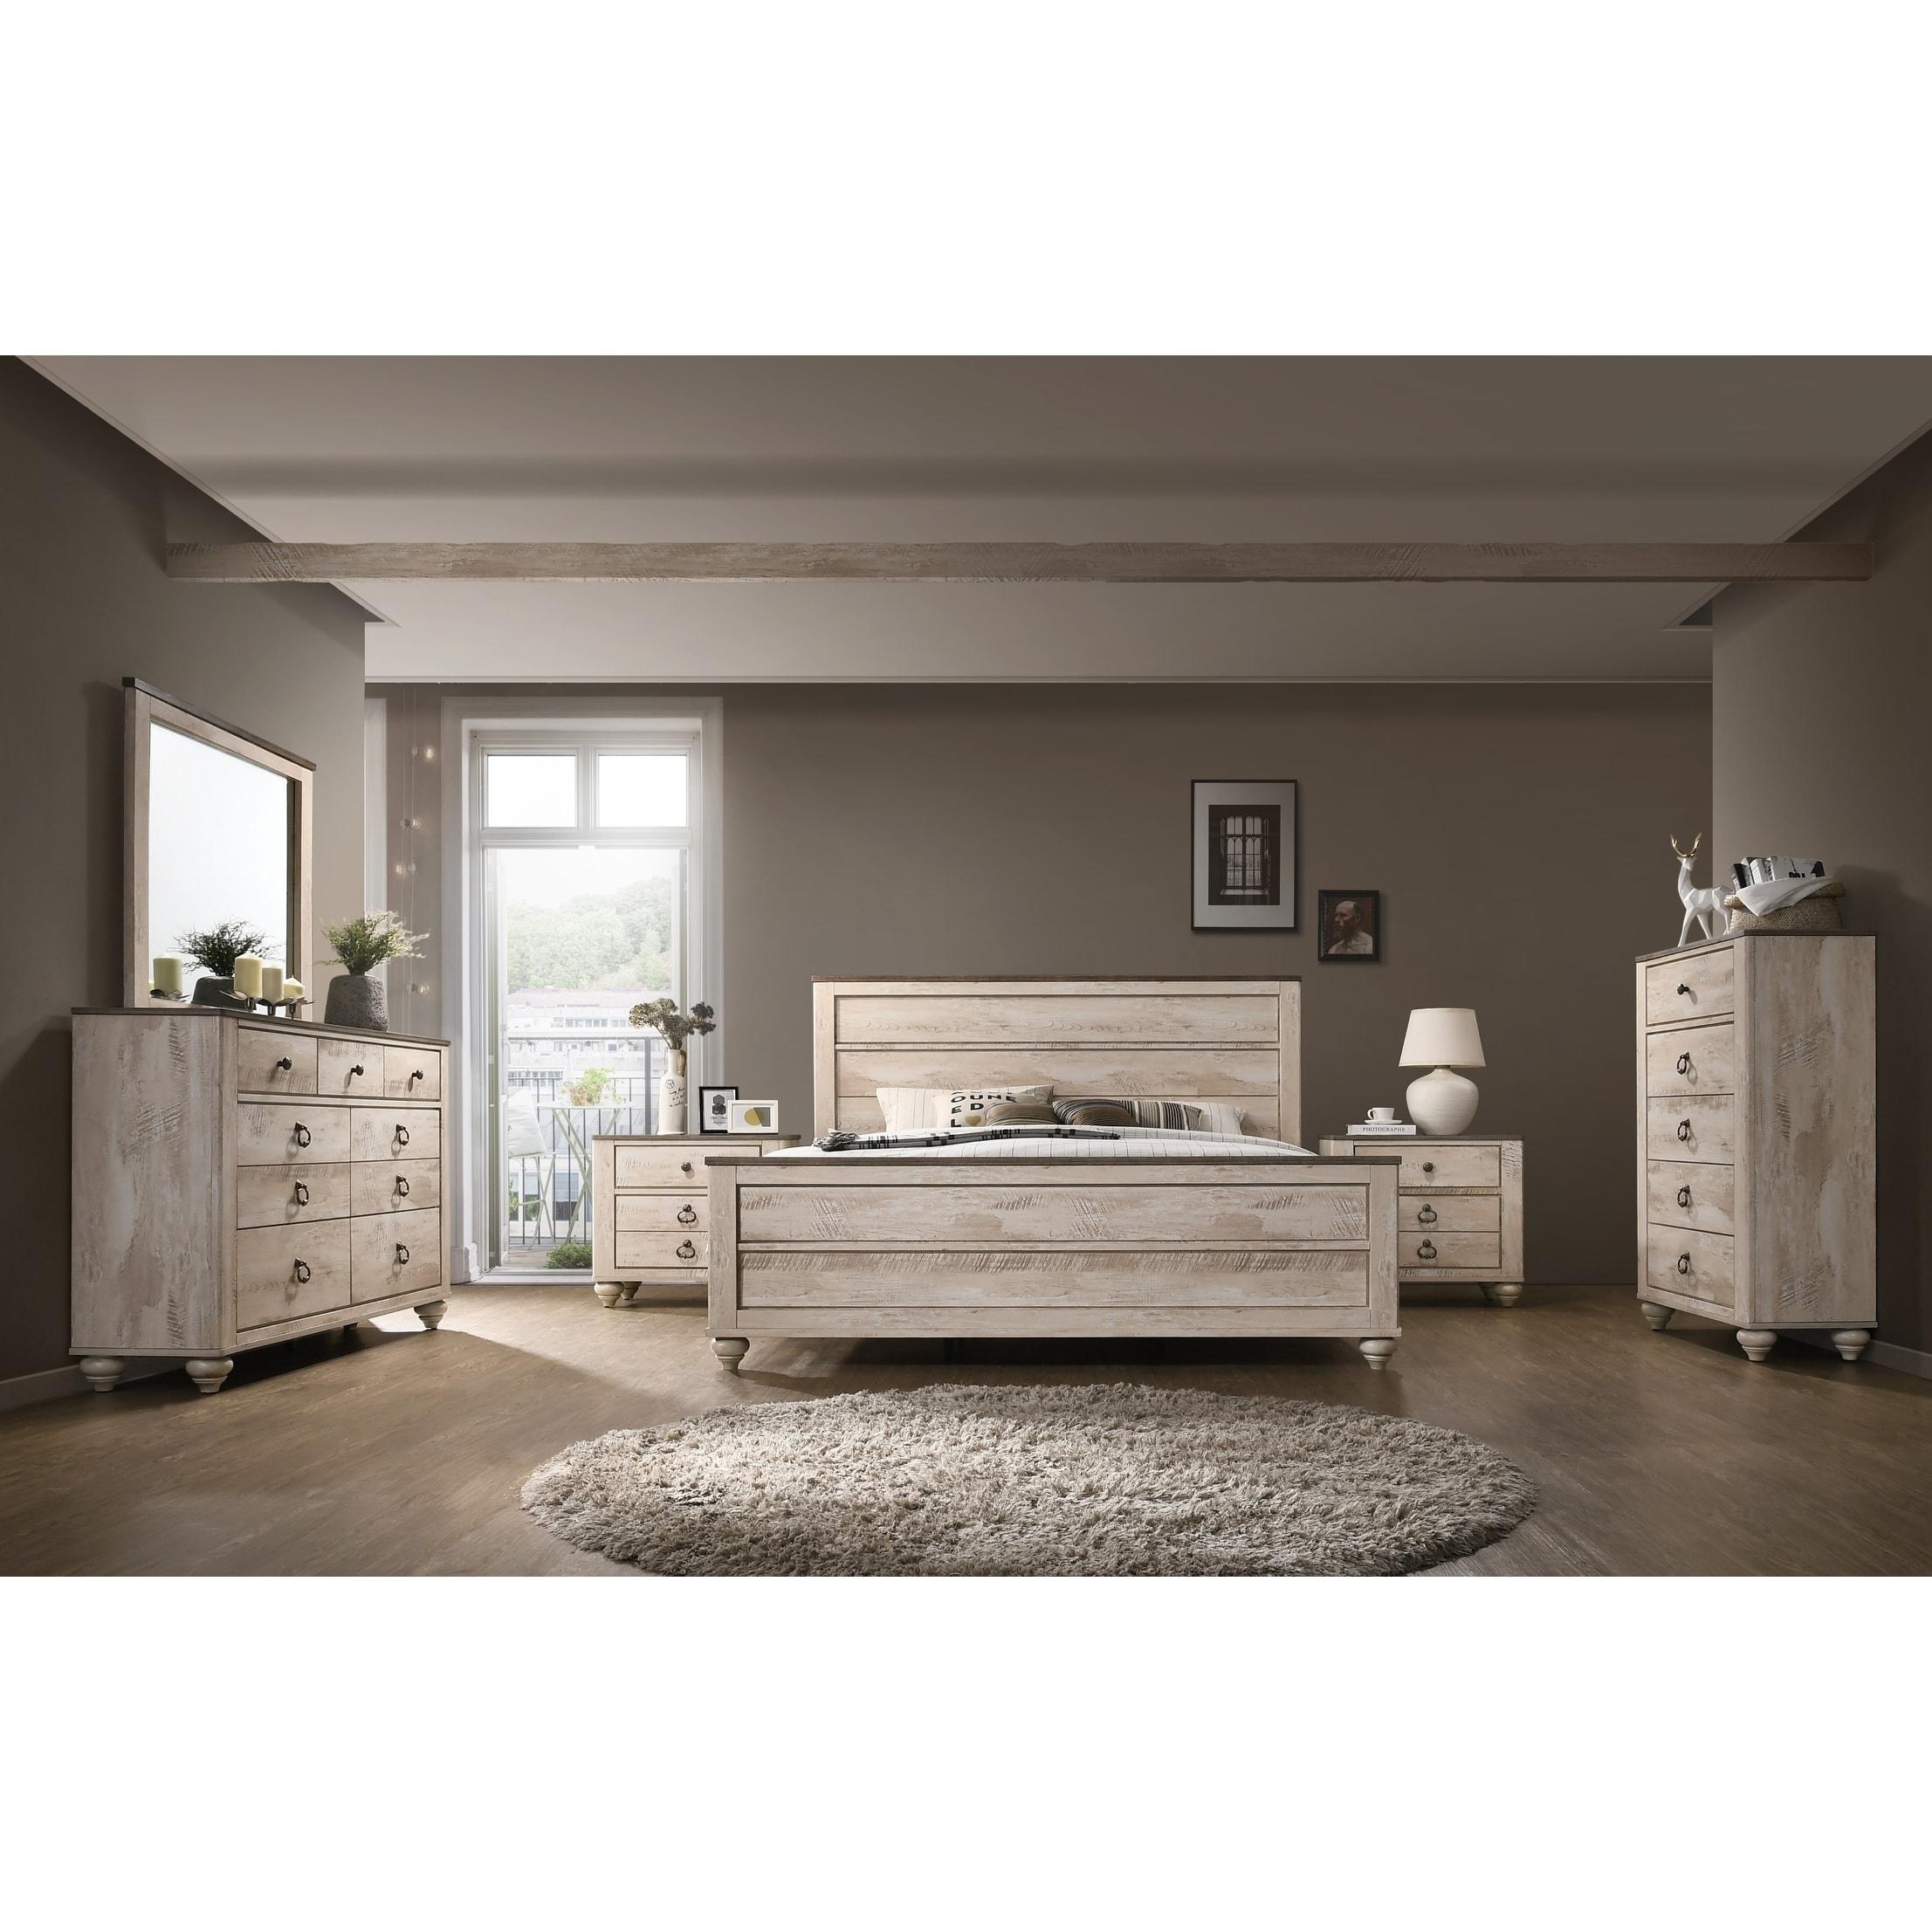 Imerland contemporary white wash finish 6 piece bedroom set king